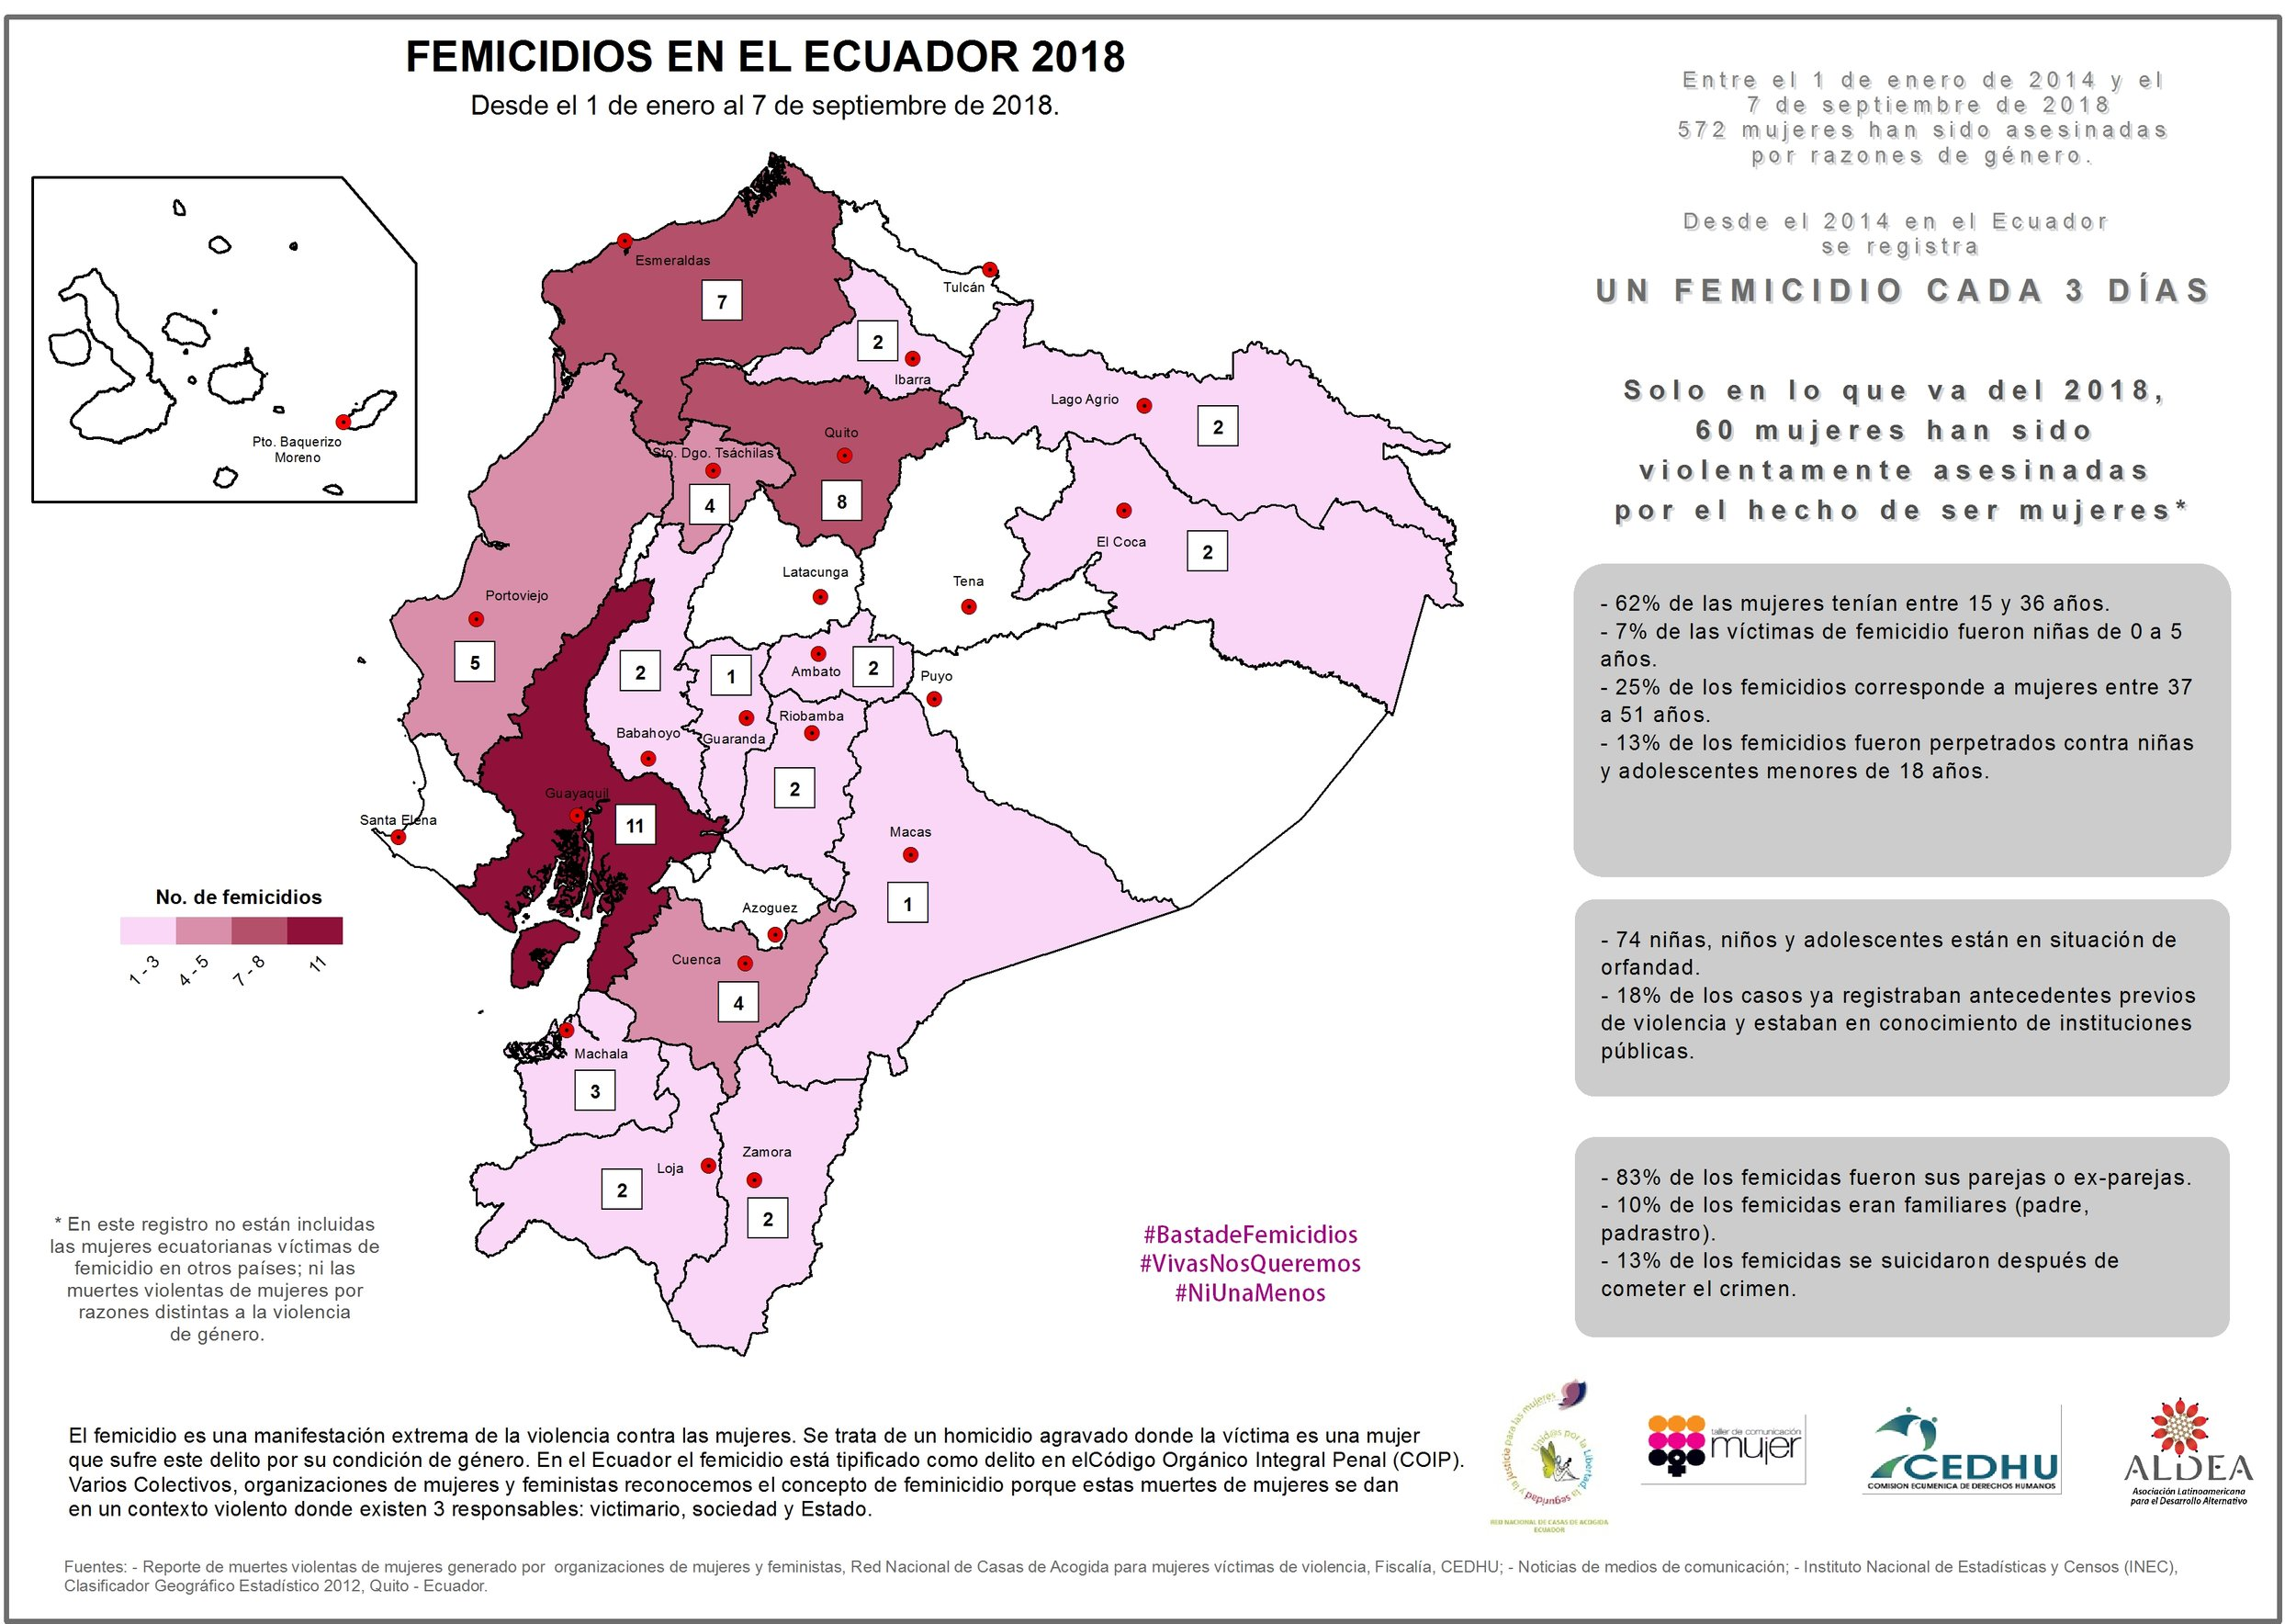 Monitoreo femicidios Ecuador 2018